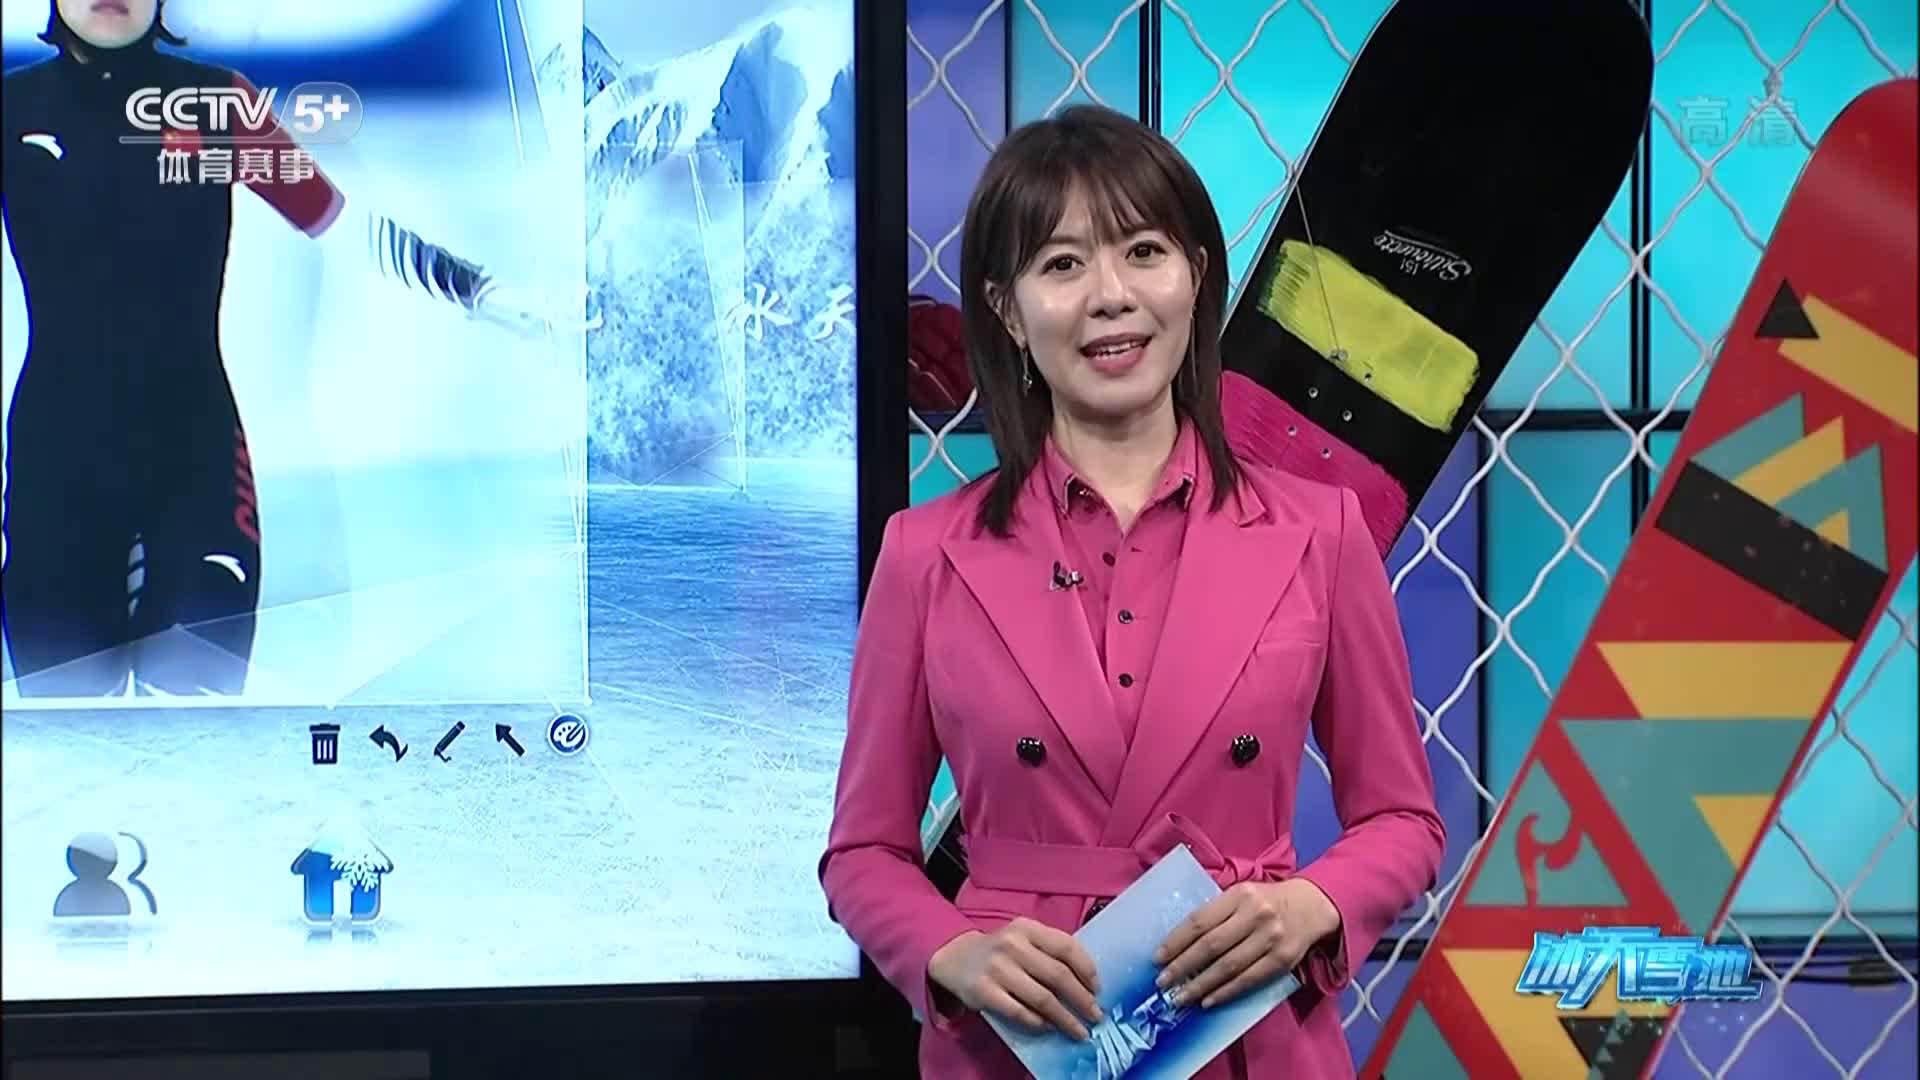 CCTV5+分享|《冰天雪地》 回顾花样滑冰莫斯科站女单比赛